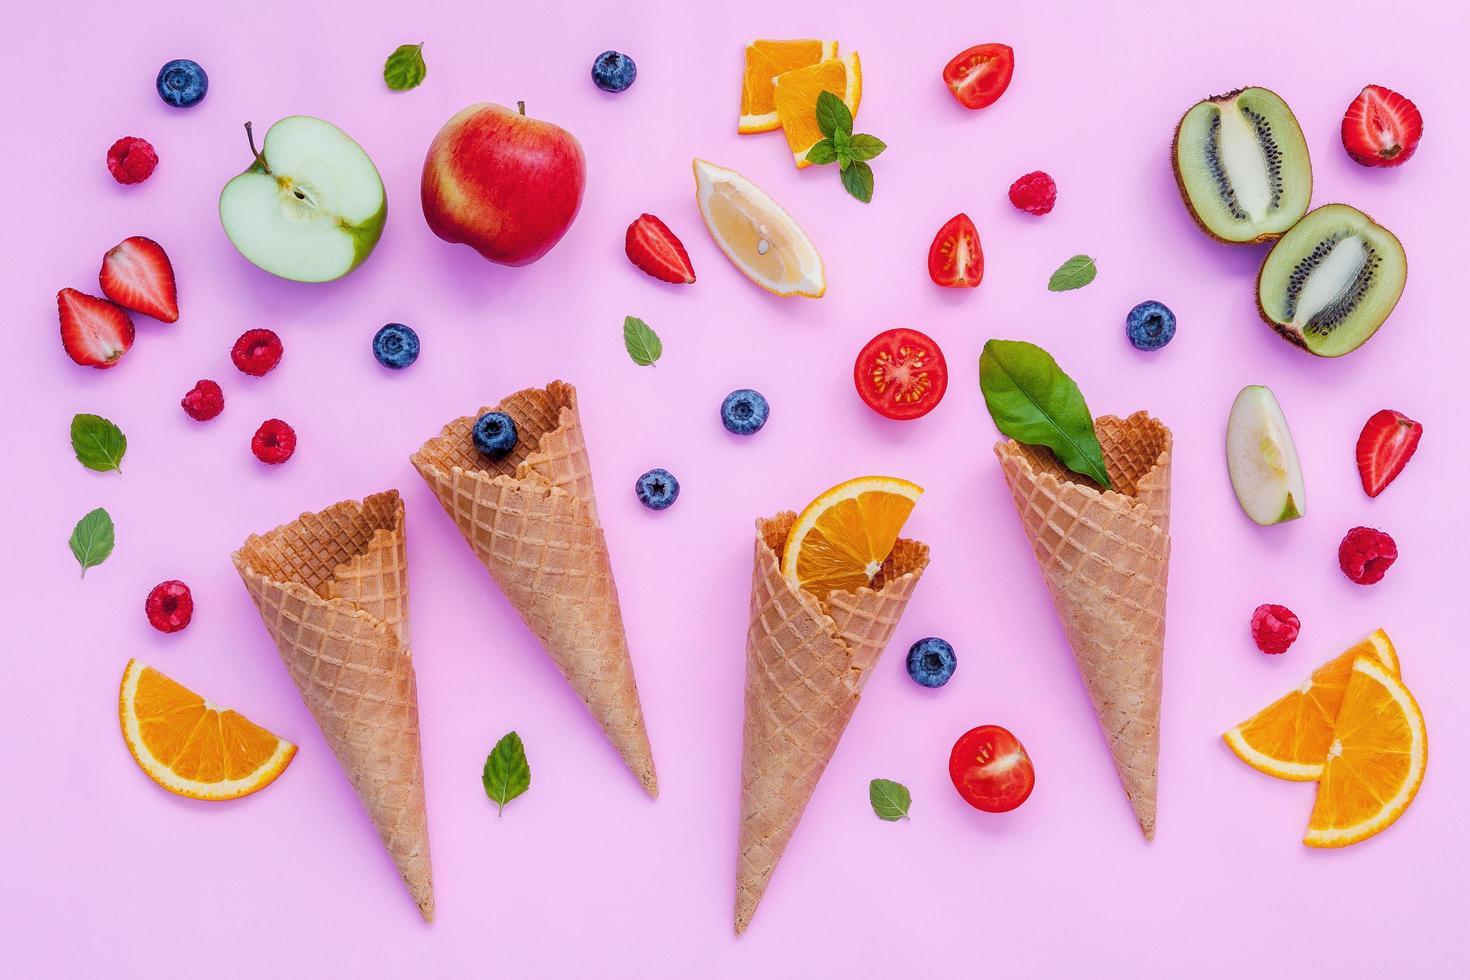 Colorful fruit and ice cream cones photo